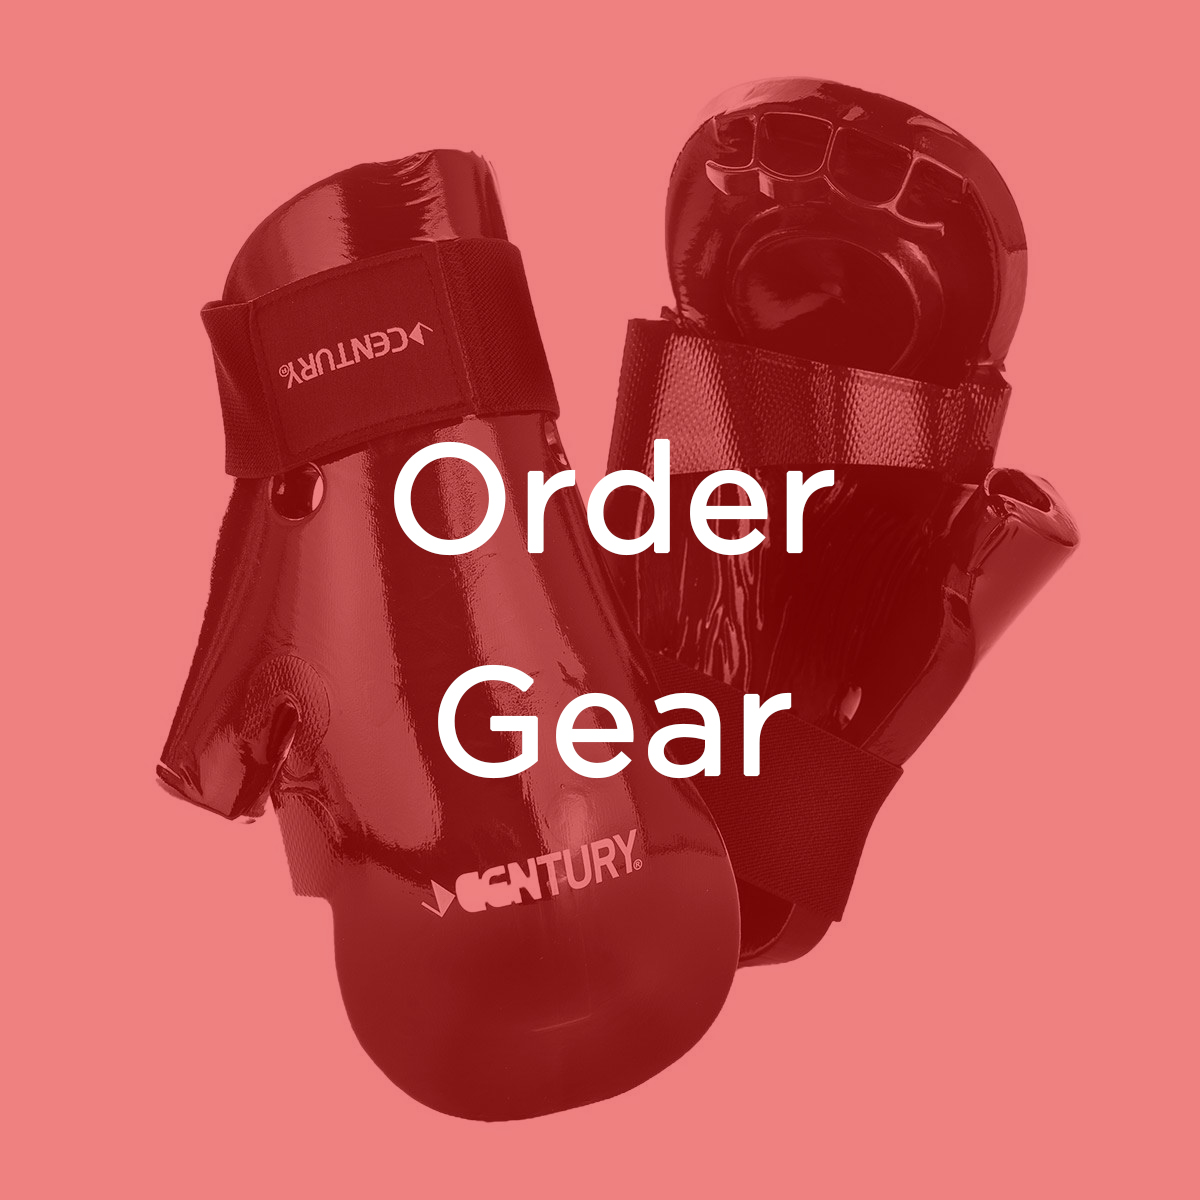 Order Gear